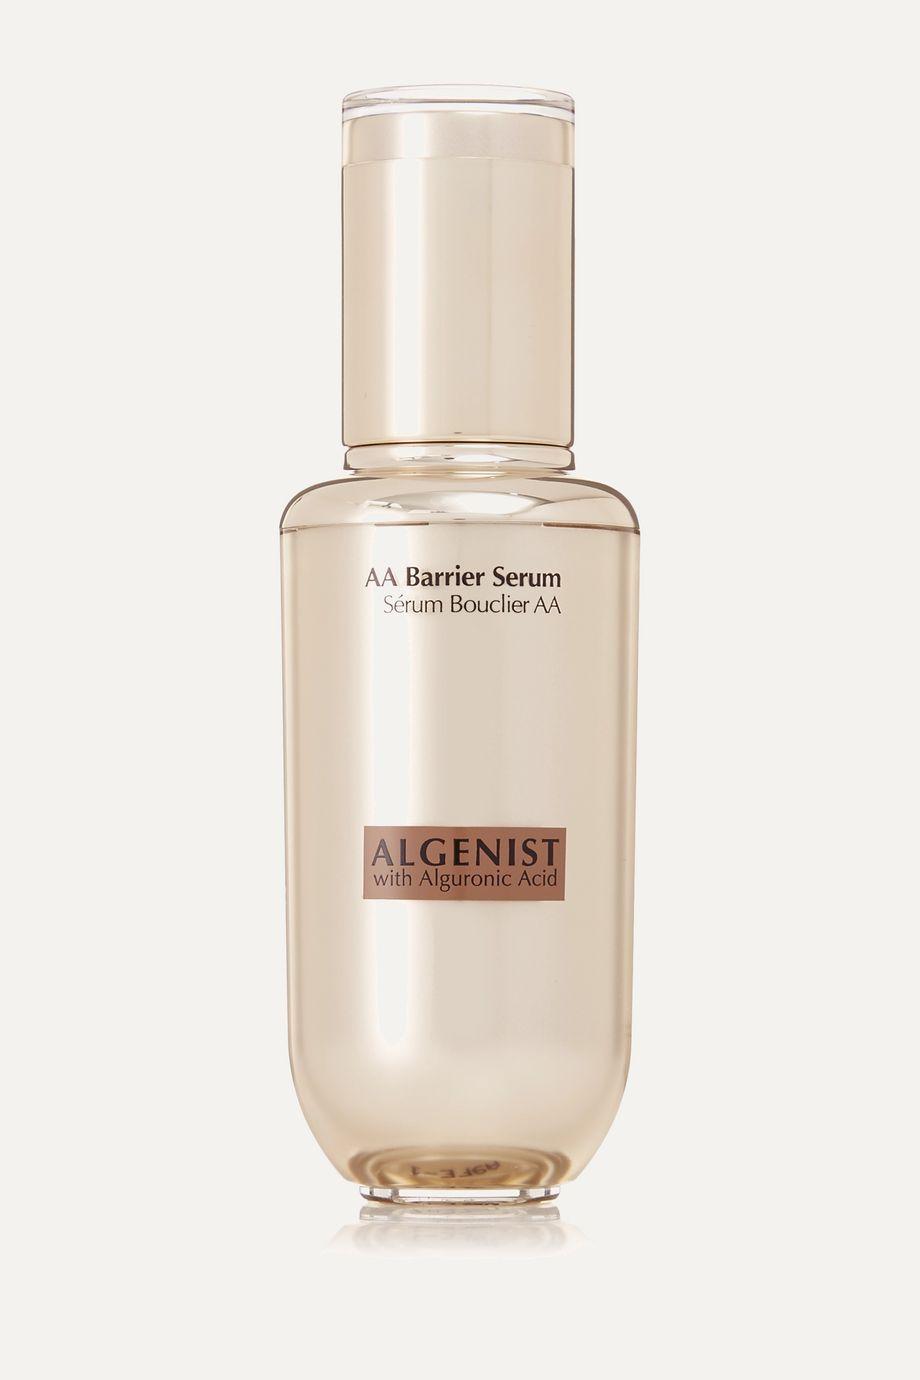 Algenist AA Barrier Serum, 30 ml – Serum